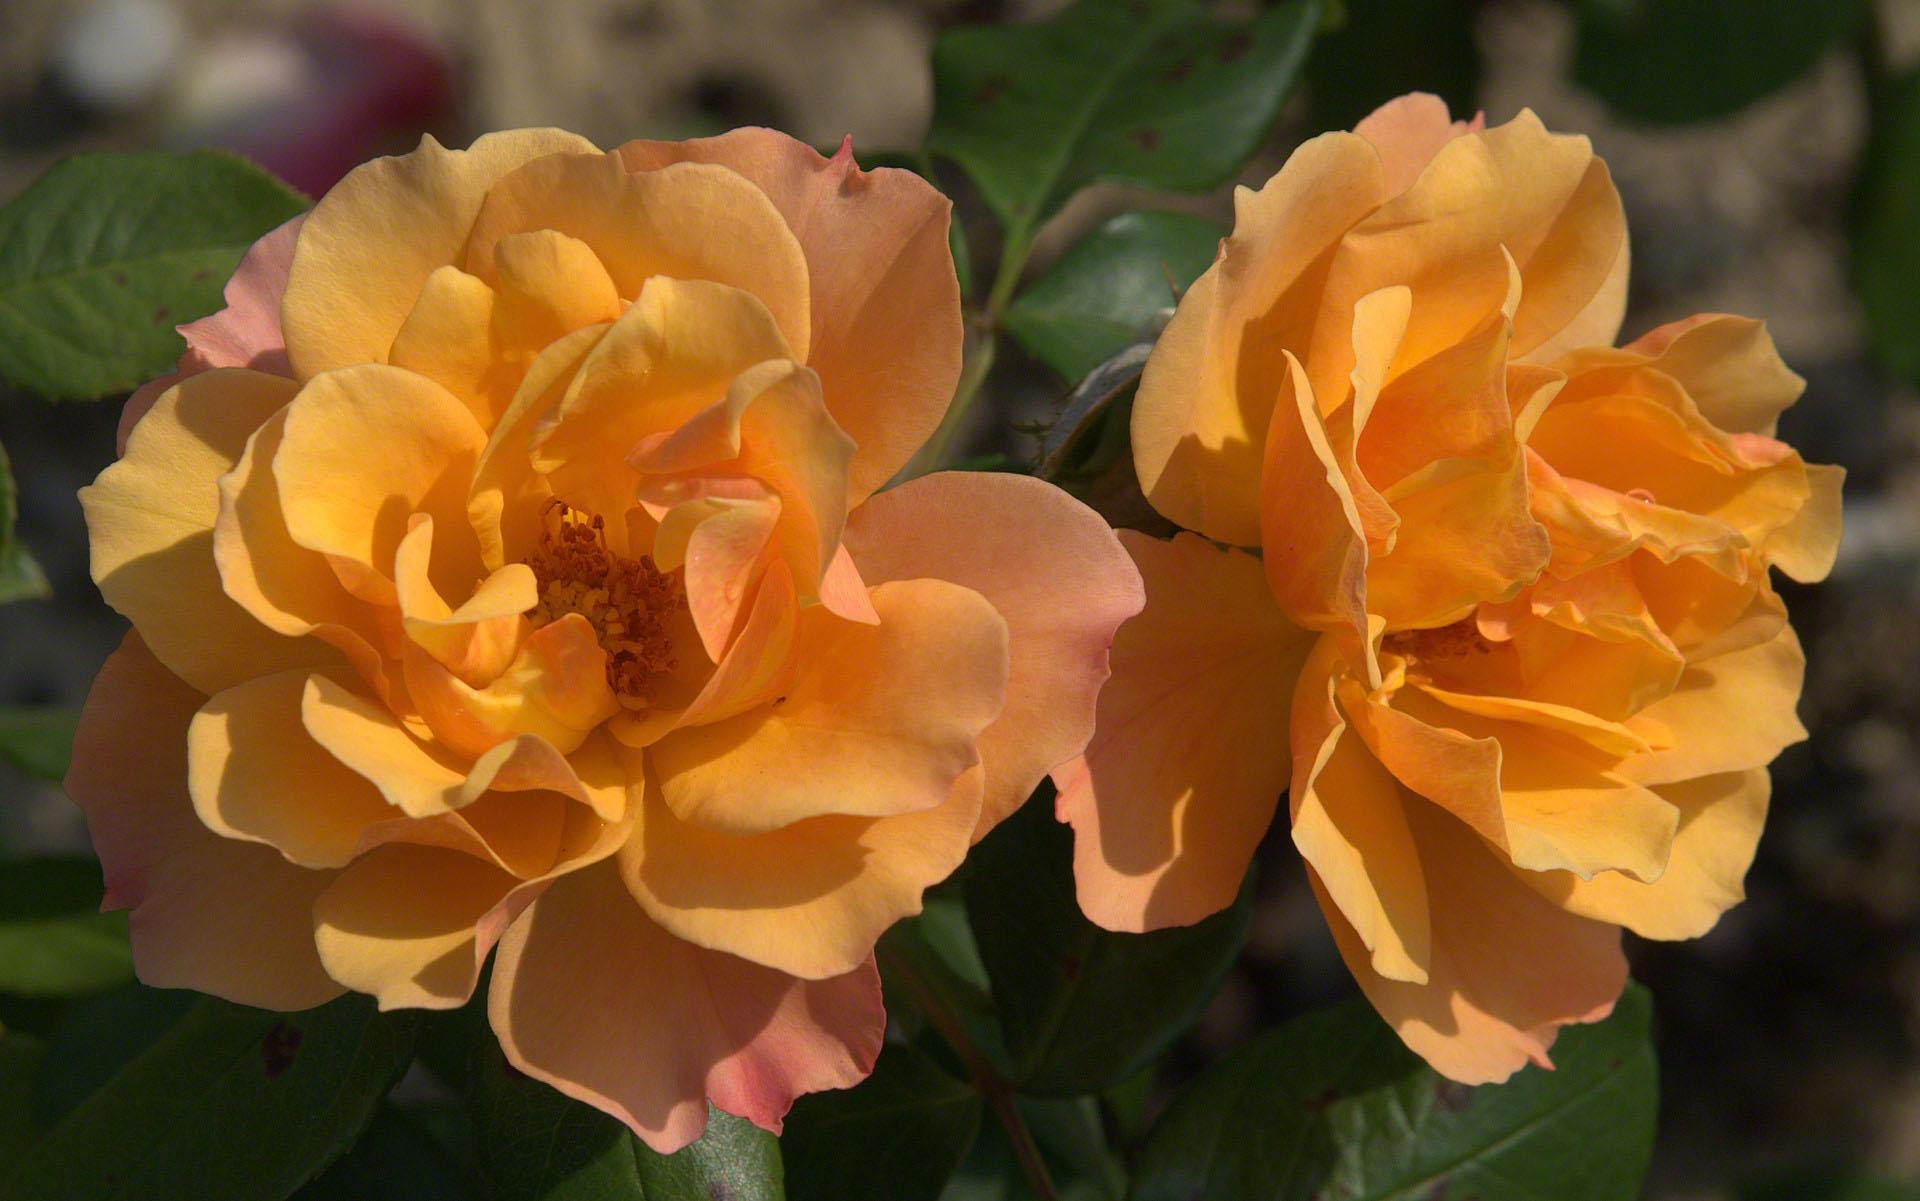 http://www.fabiovisentin.com/photography/photo/12/orange-pink-rose-dsc02357.jpg